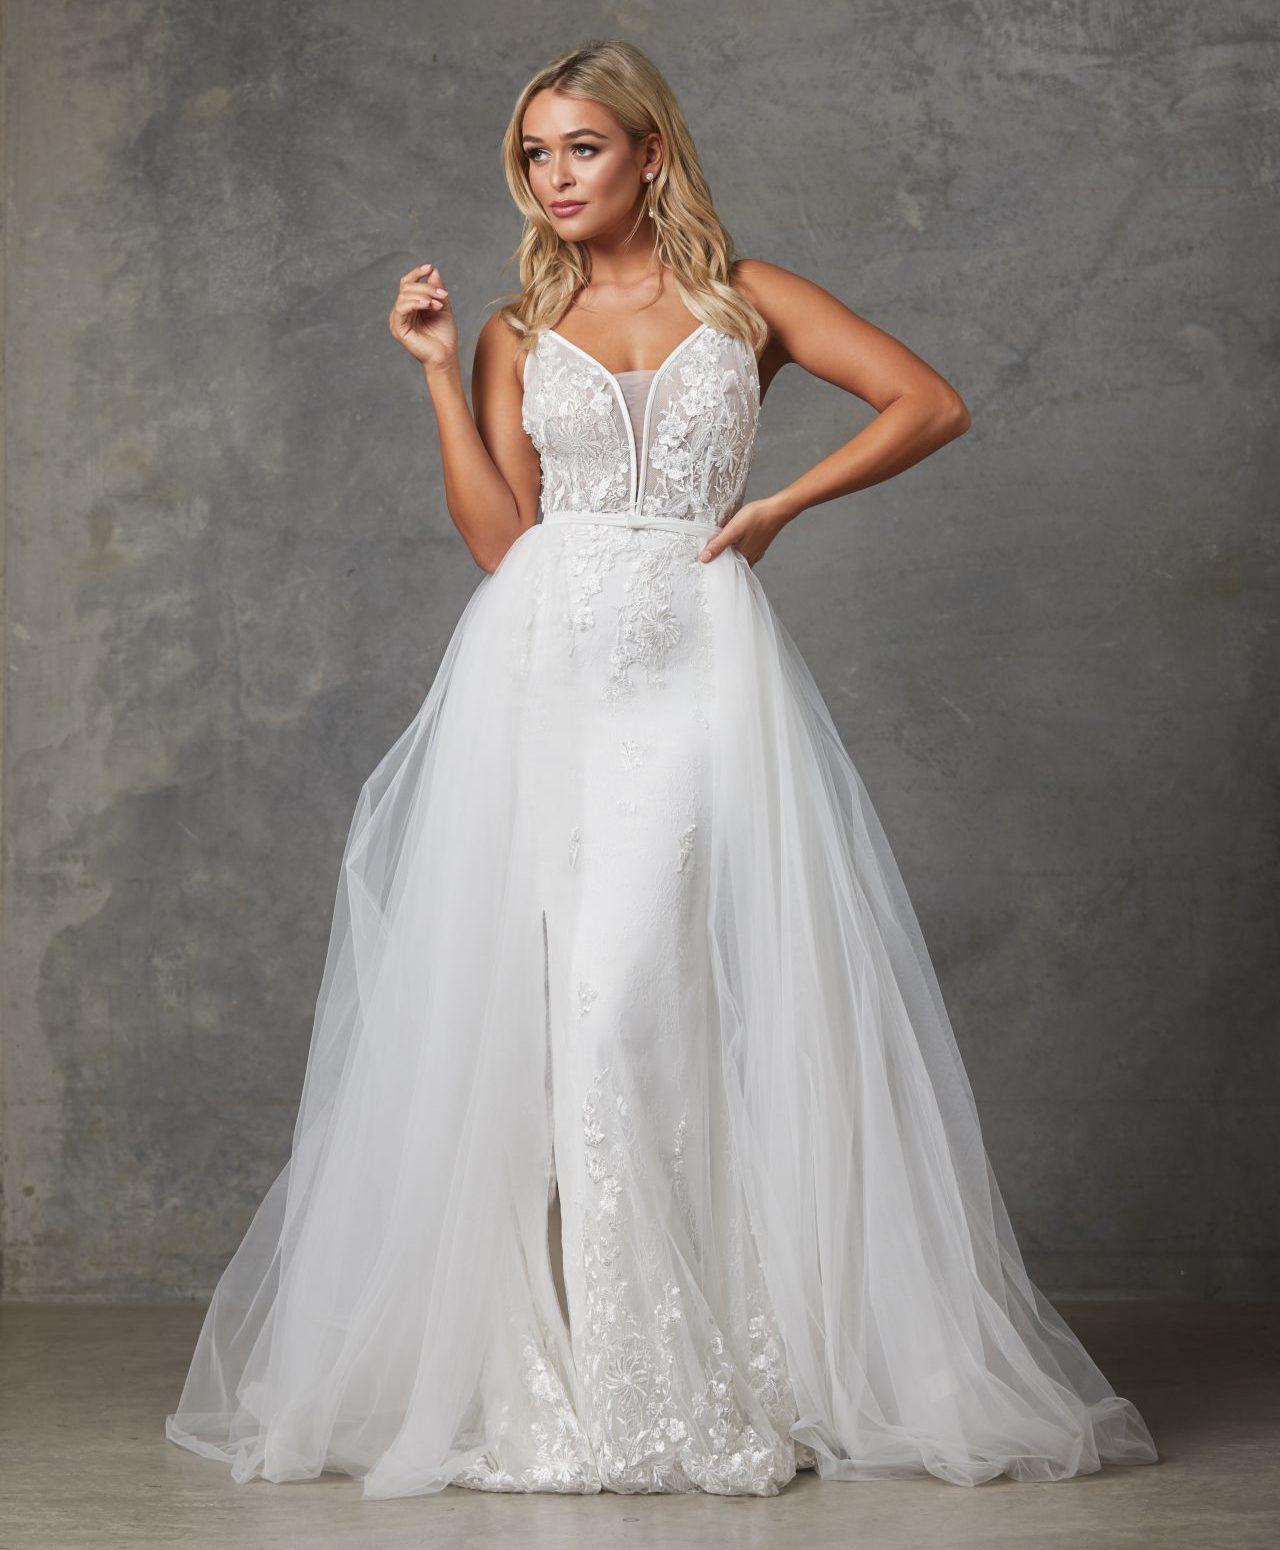 Detachable Wedding Dress.Detachable Skirt